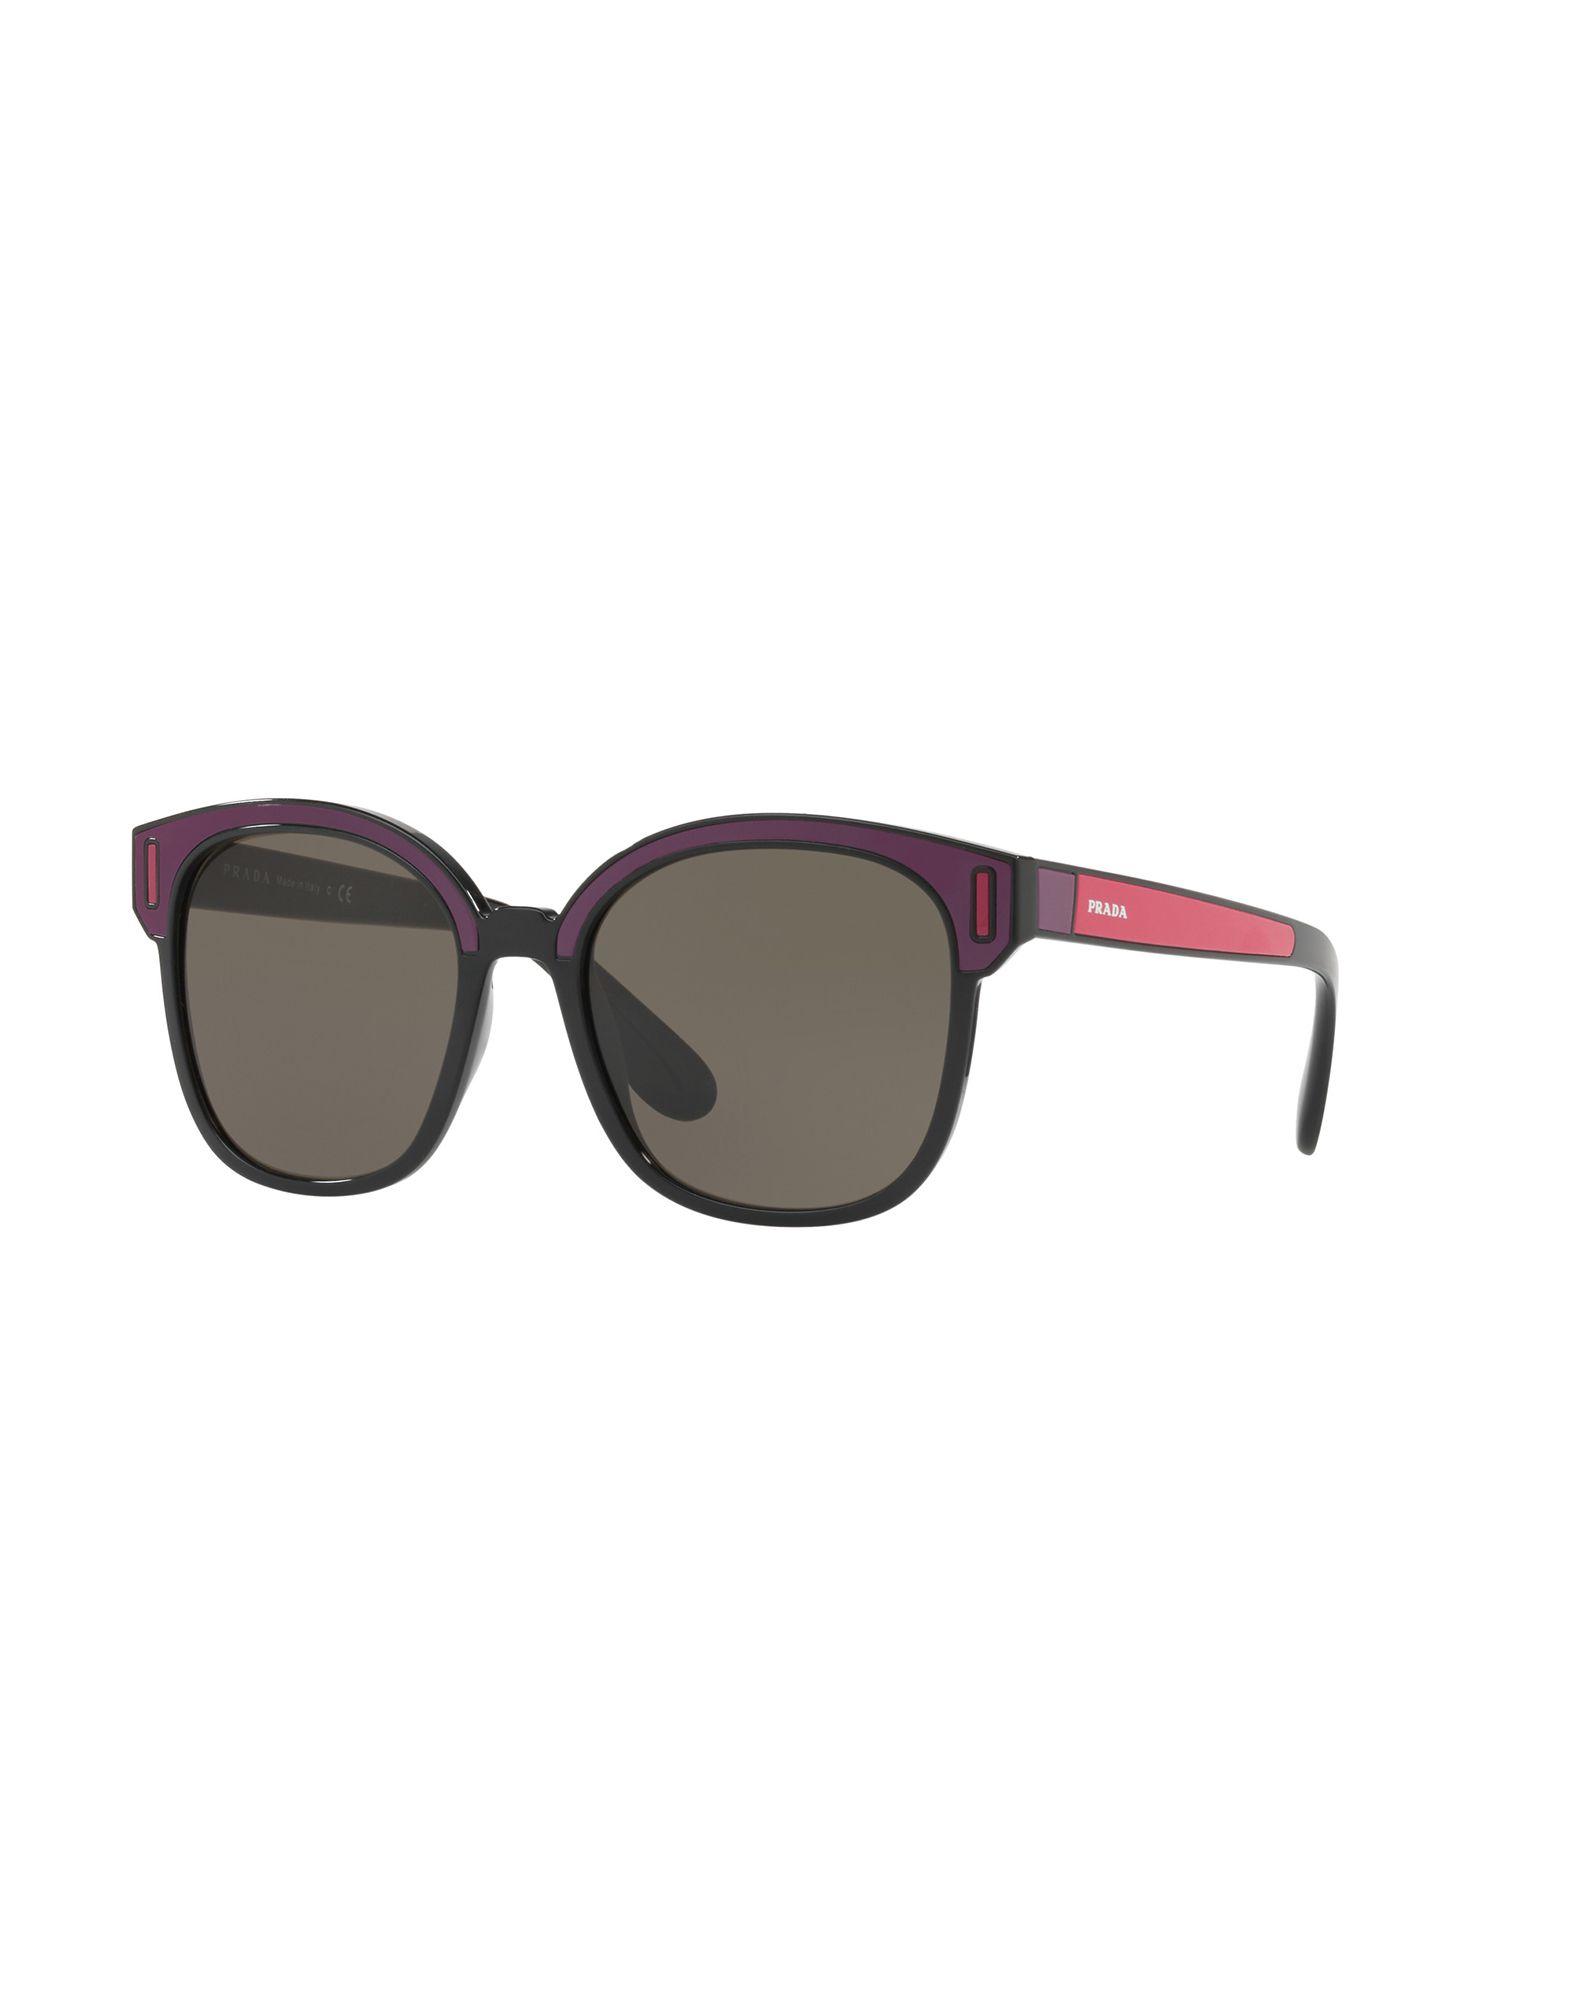 Occhiali Da Sole Prada Pr 05Us - Donna - Acquista online su